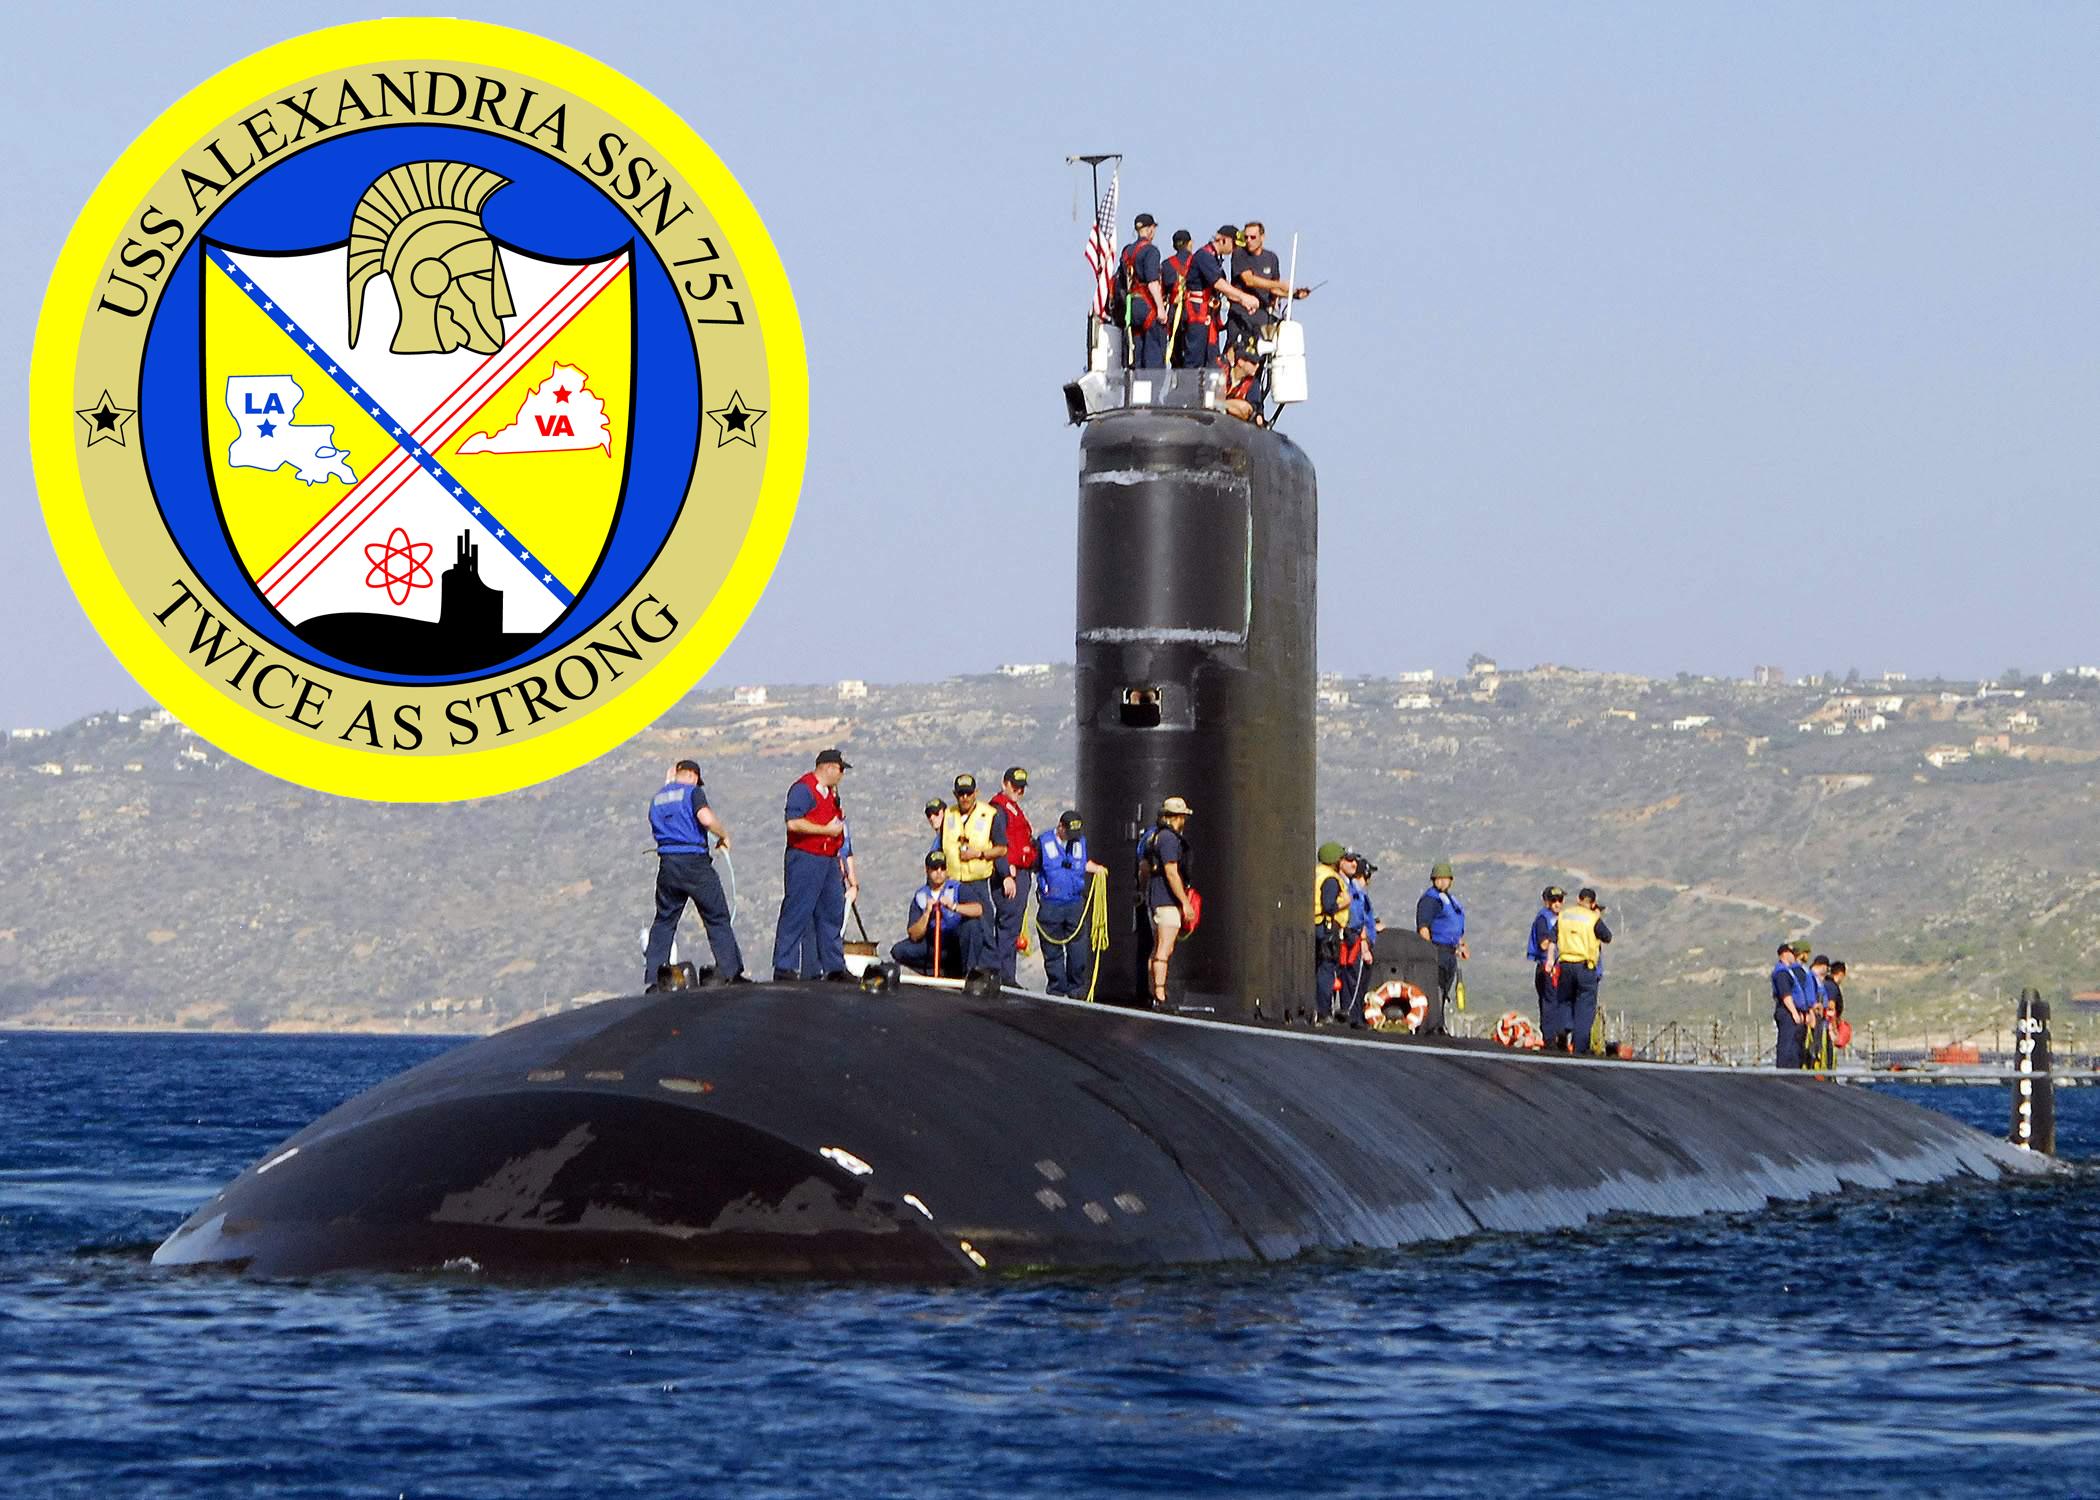 USS ALEXANDRIA SSN-757 Bild und Grafik: U.S. Navy